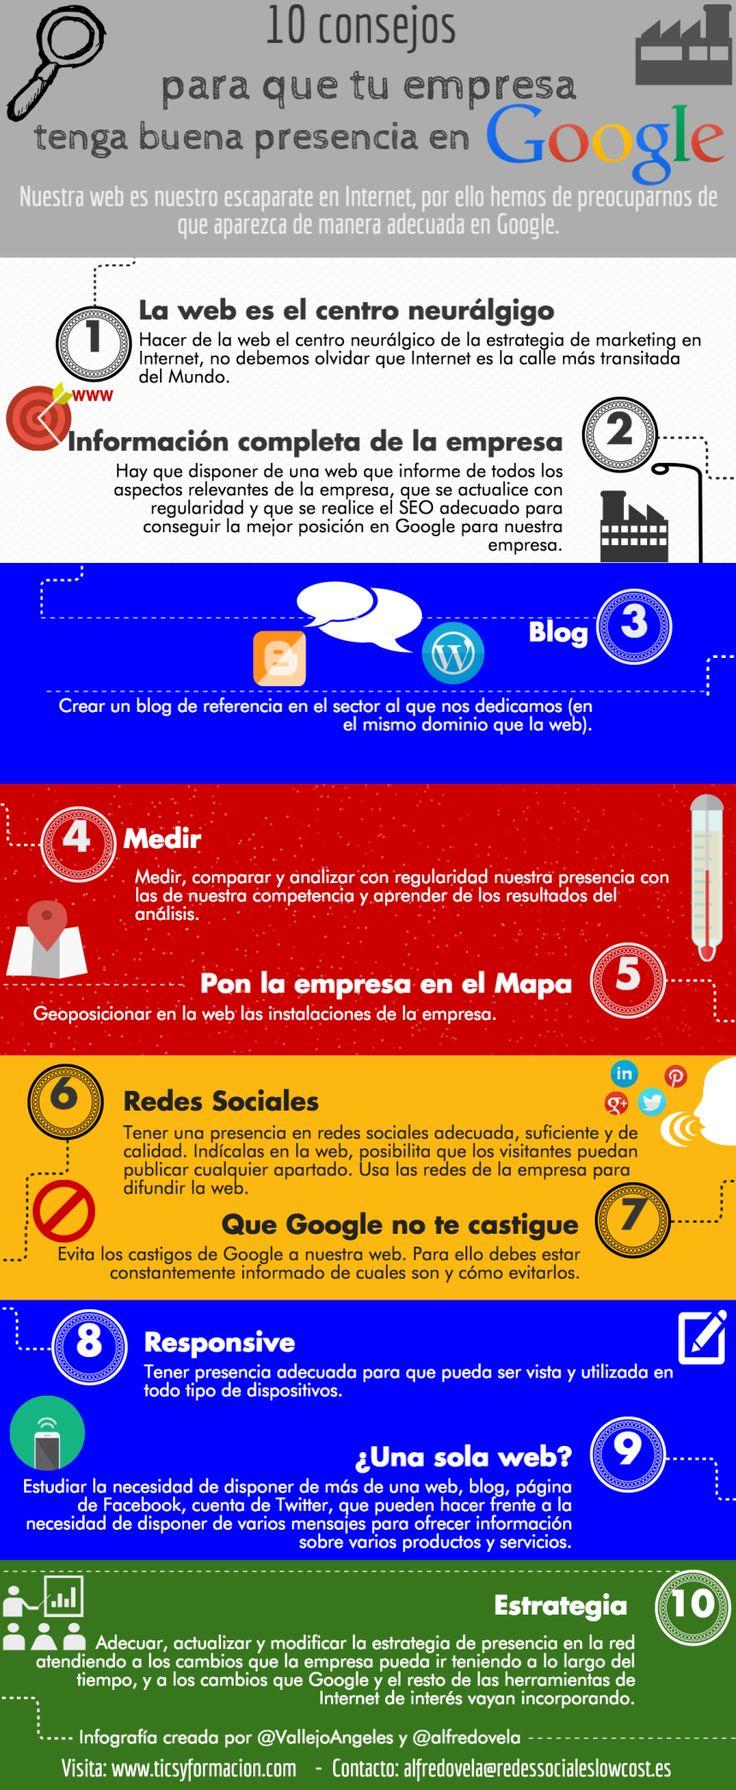 10 consejos para que tu empresa tenga buena presencia en Google #infografia #marketing